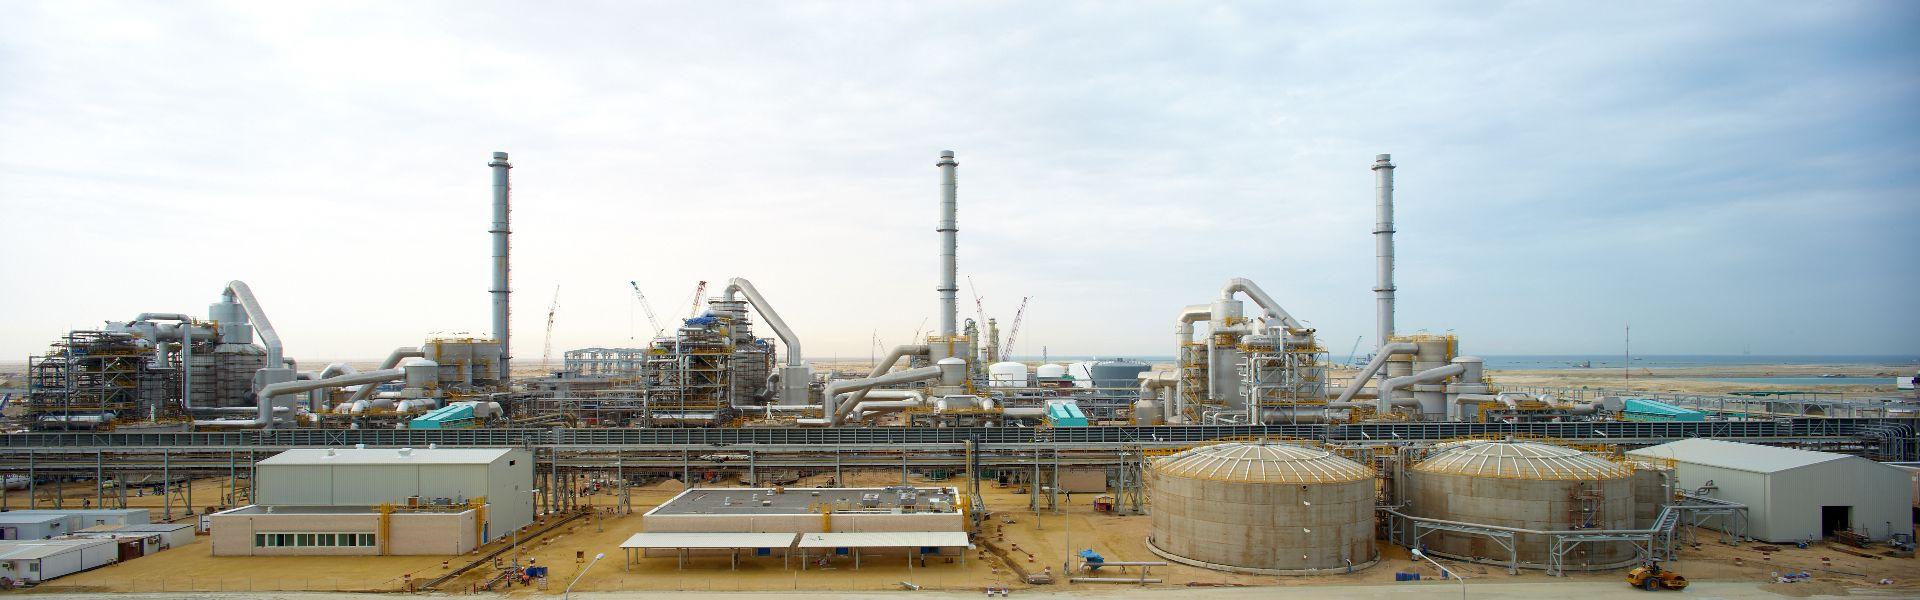 GAMA Endüstri | Ma'aden Sulphuric Acid Plant |